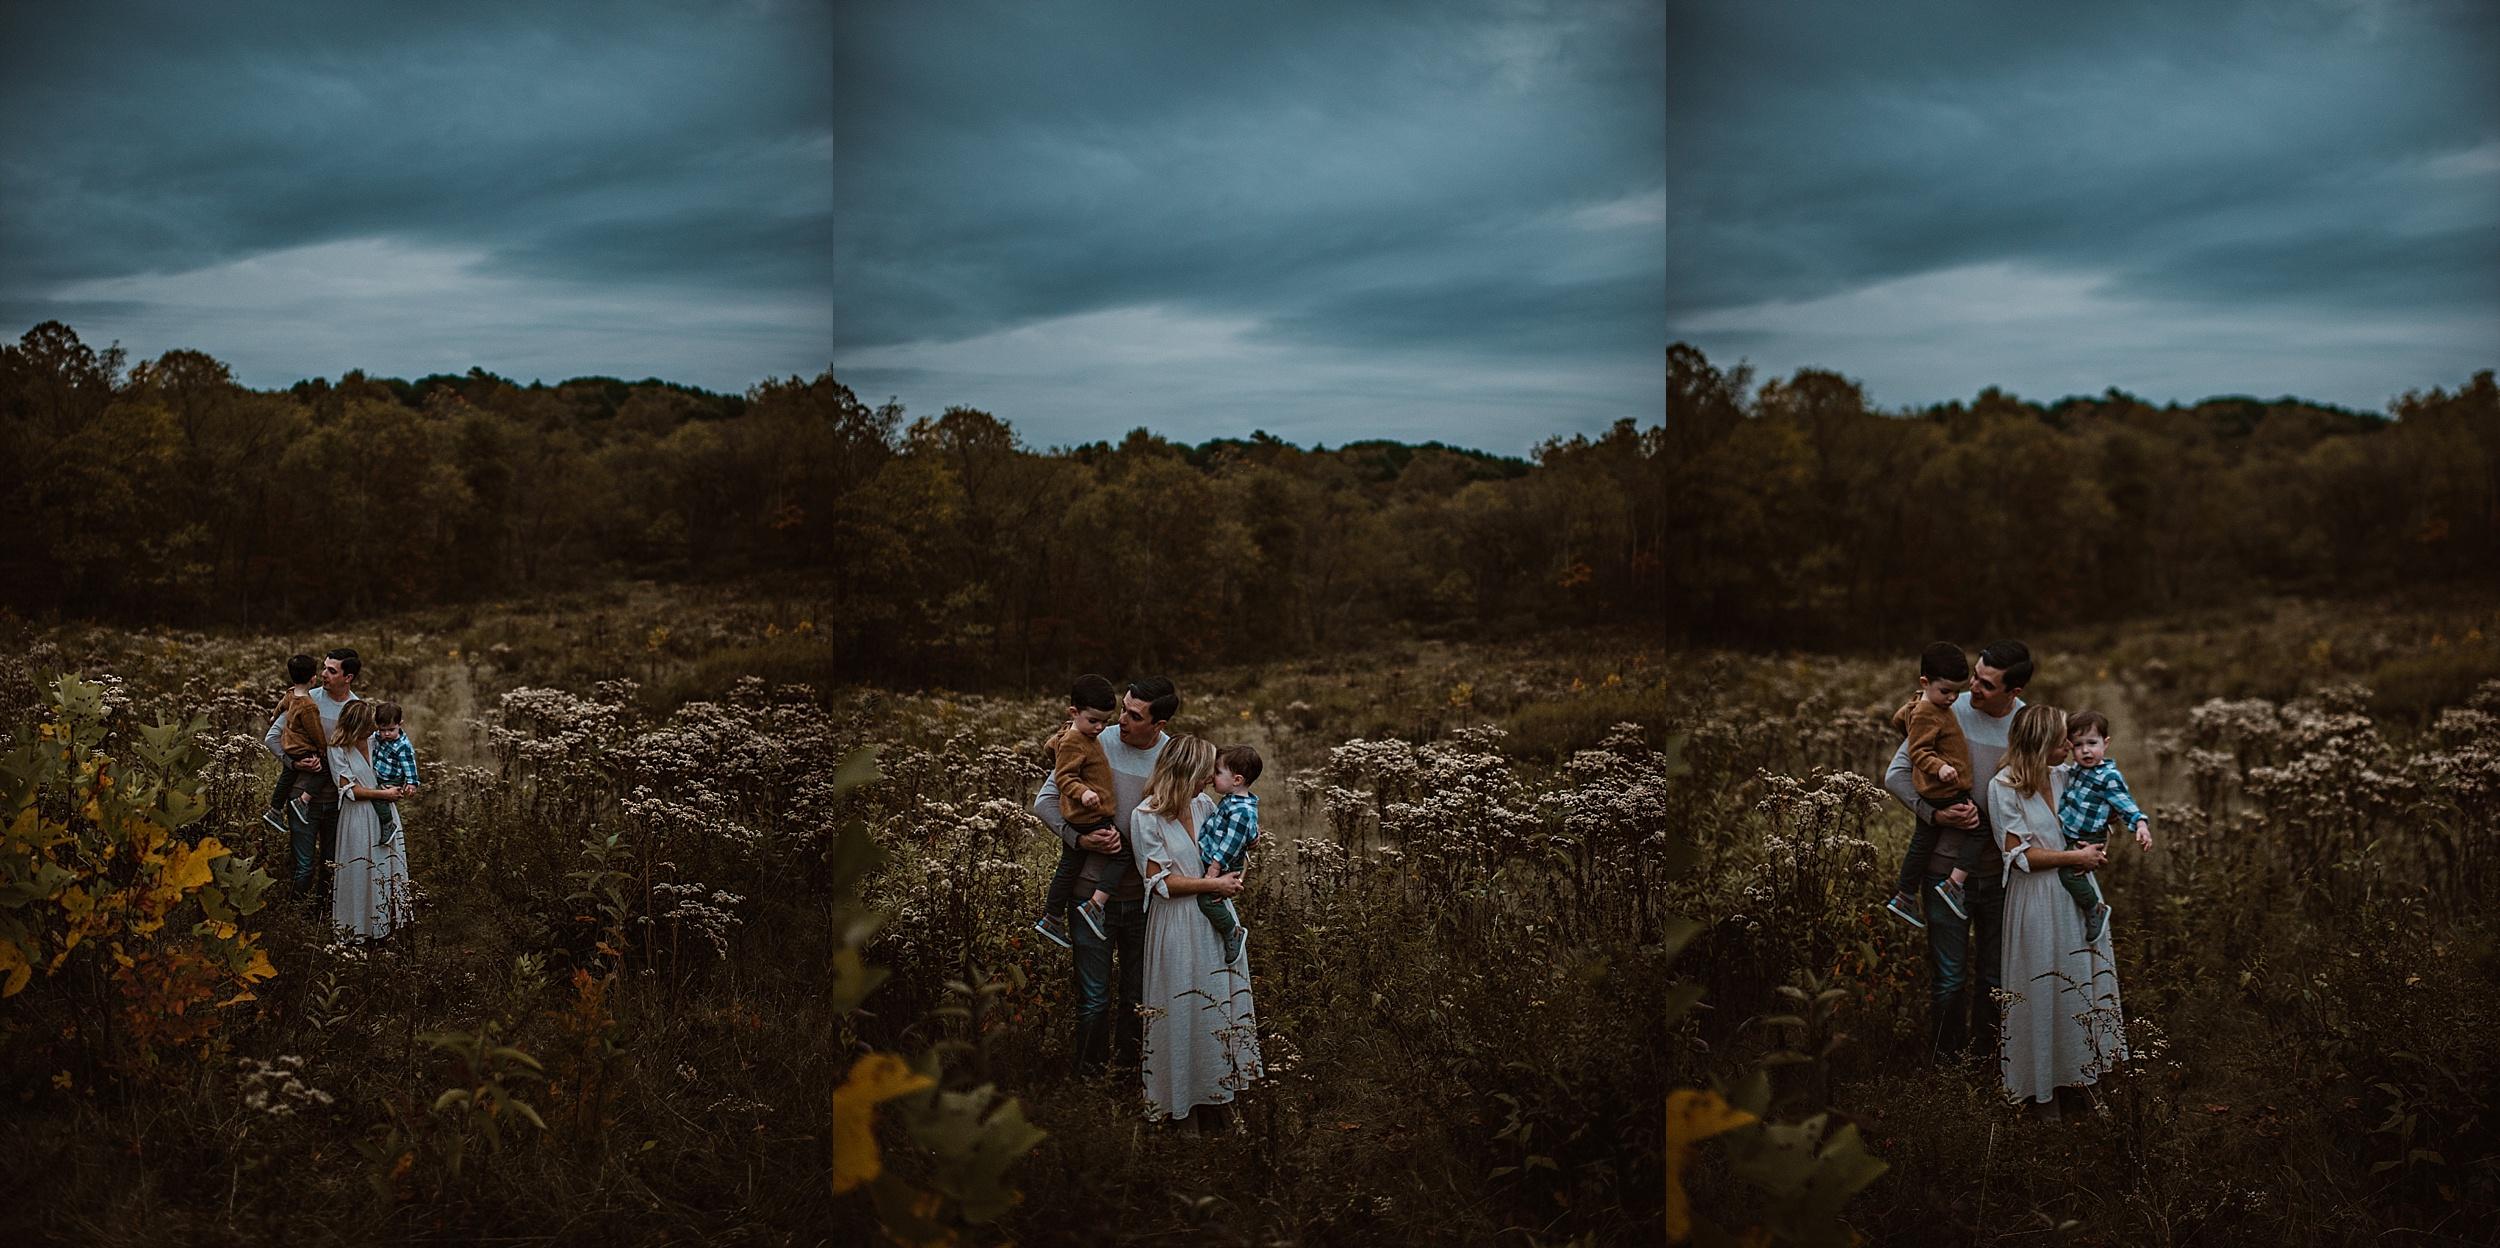 lauren-grayson-photography-portrait-artist-akron-cleveland-ohio-photographer-family-session-fields-sunset-fall_0226.jpg